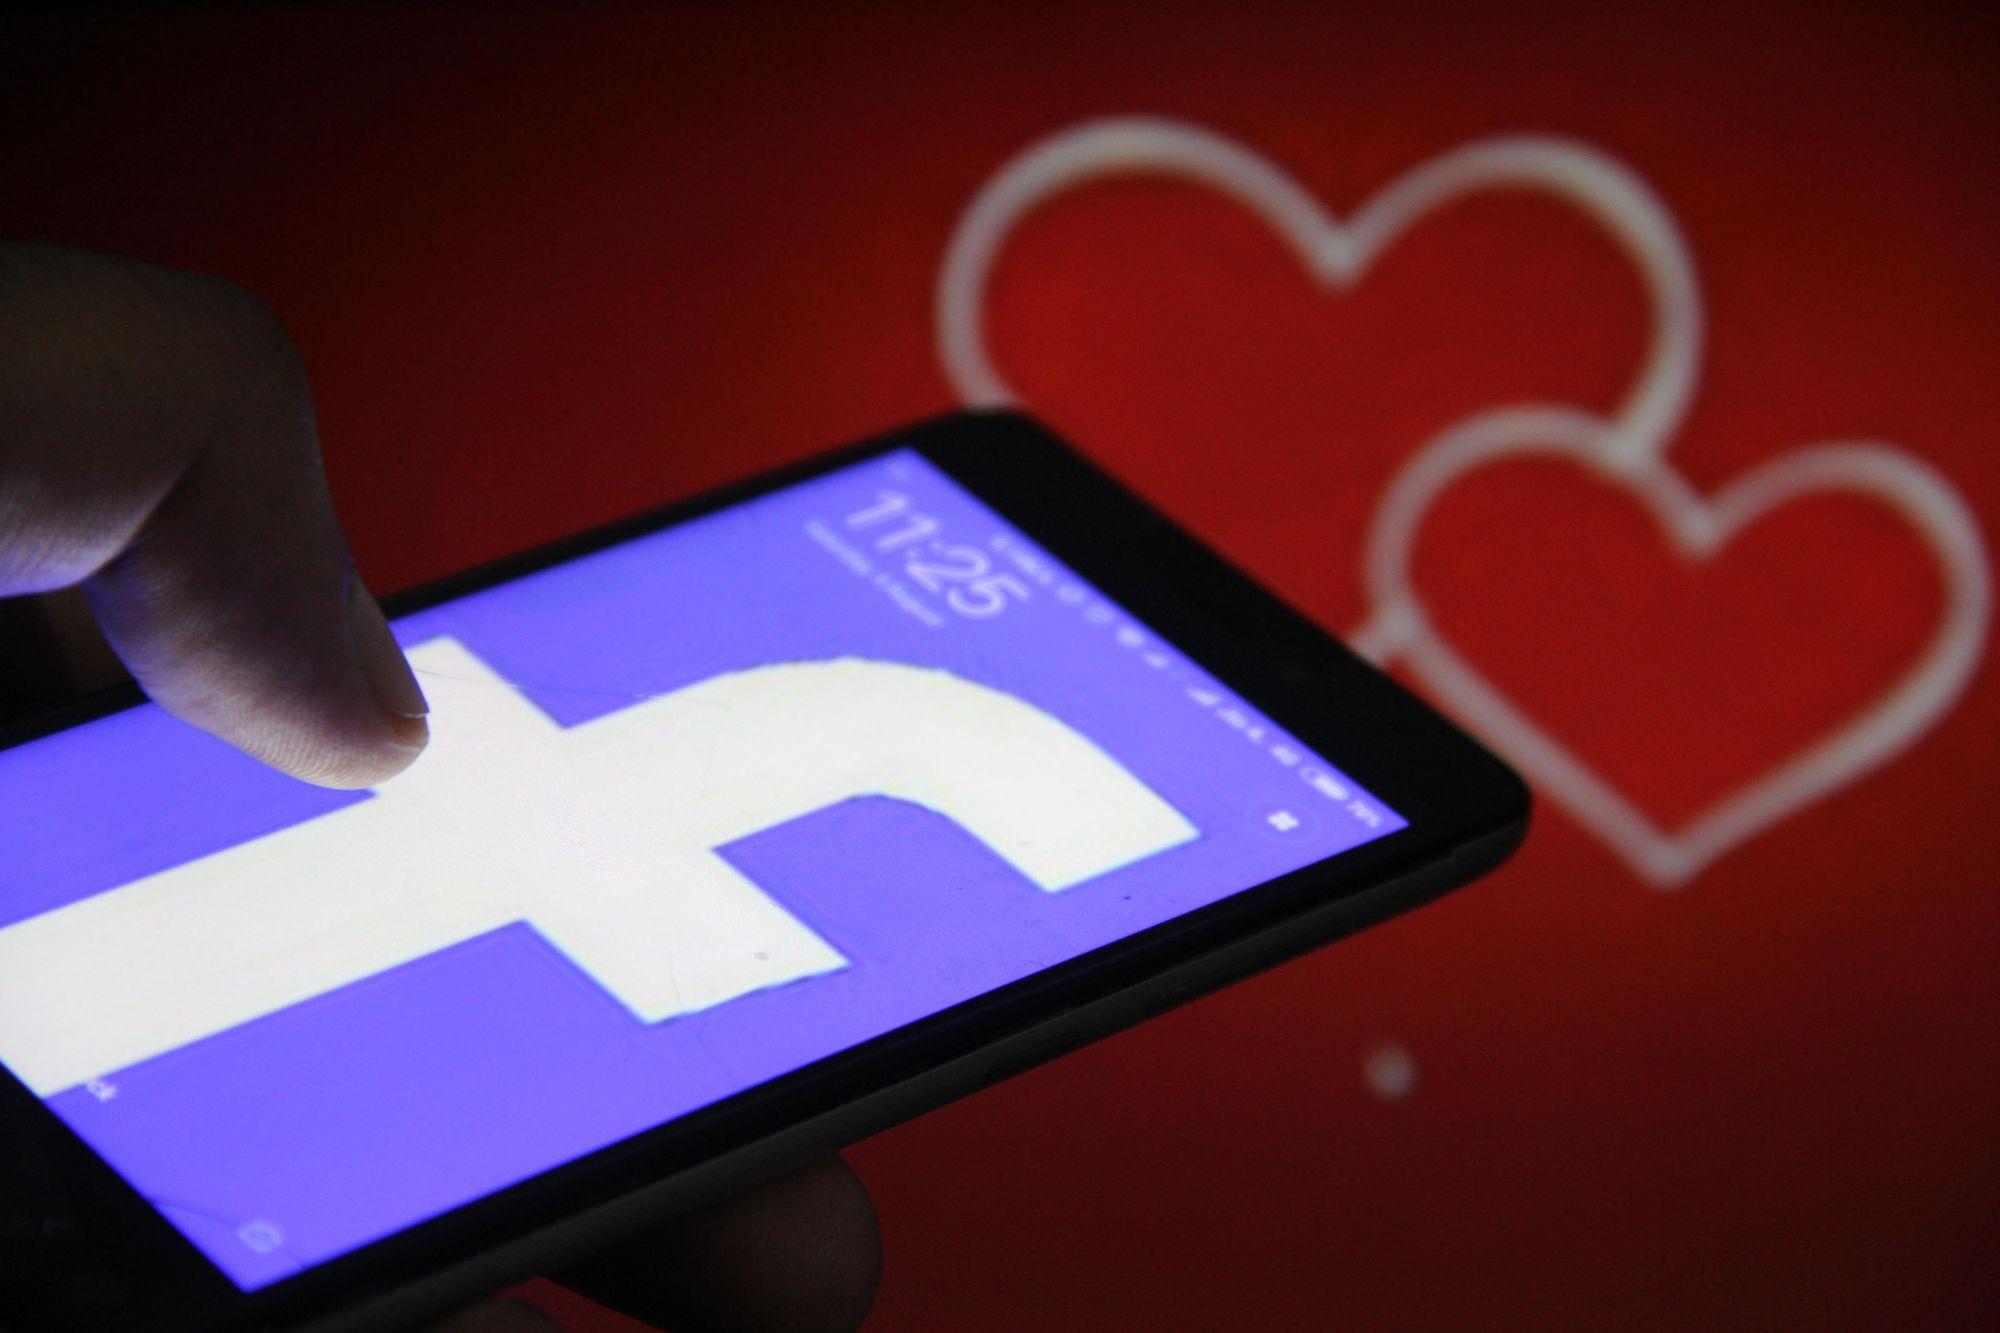 gratuit Christian Dating sa Internet Dating noms d'utilisateur